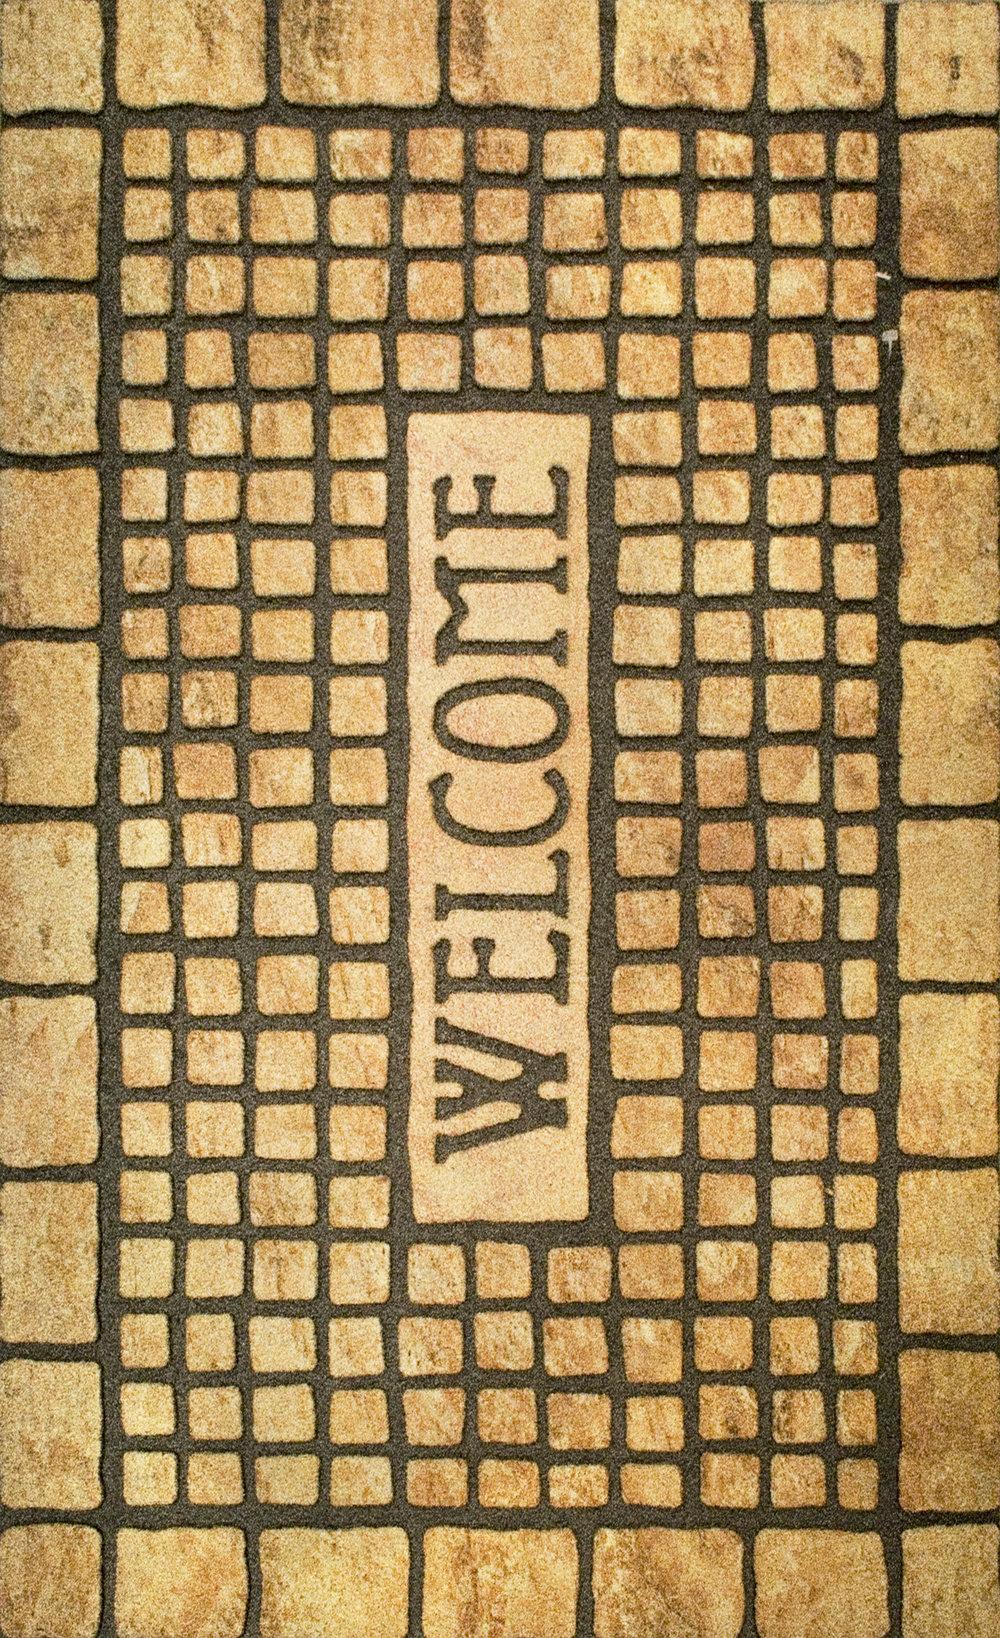 Antique Bricks Mat.jpg